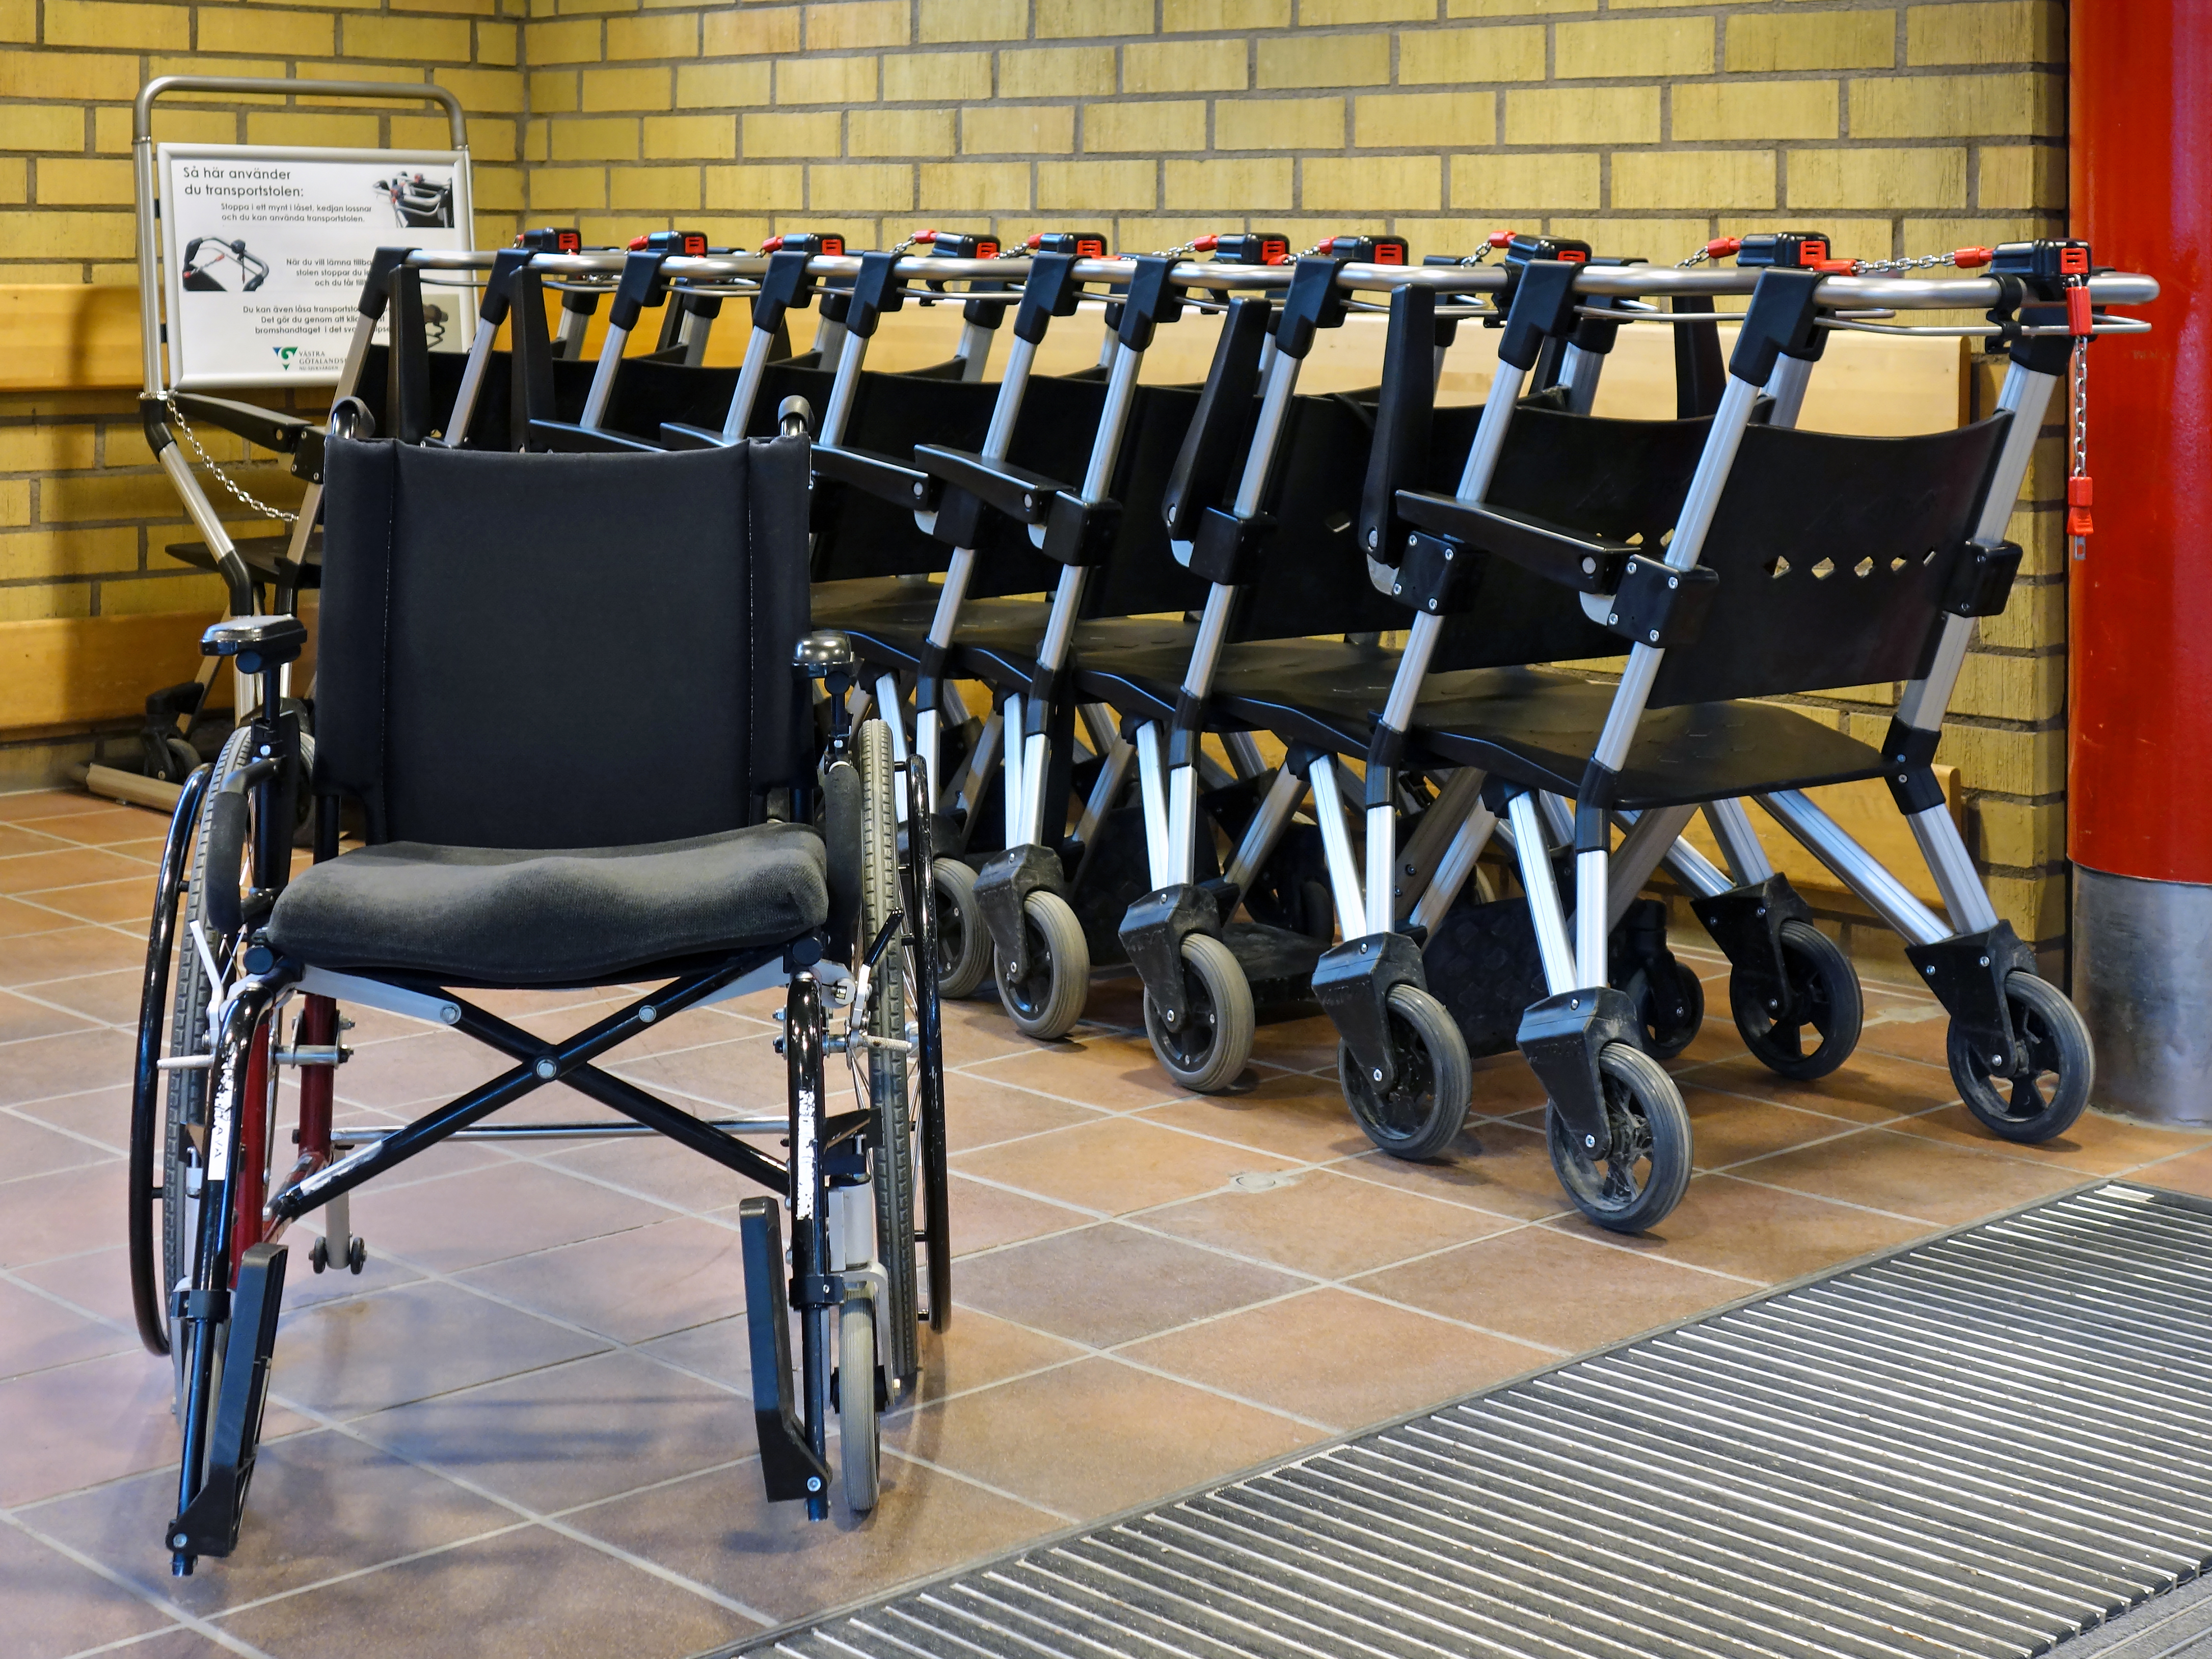 How do Hospitals Prevent Wheelchair Theft?